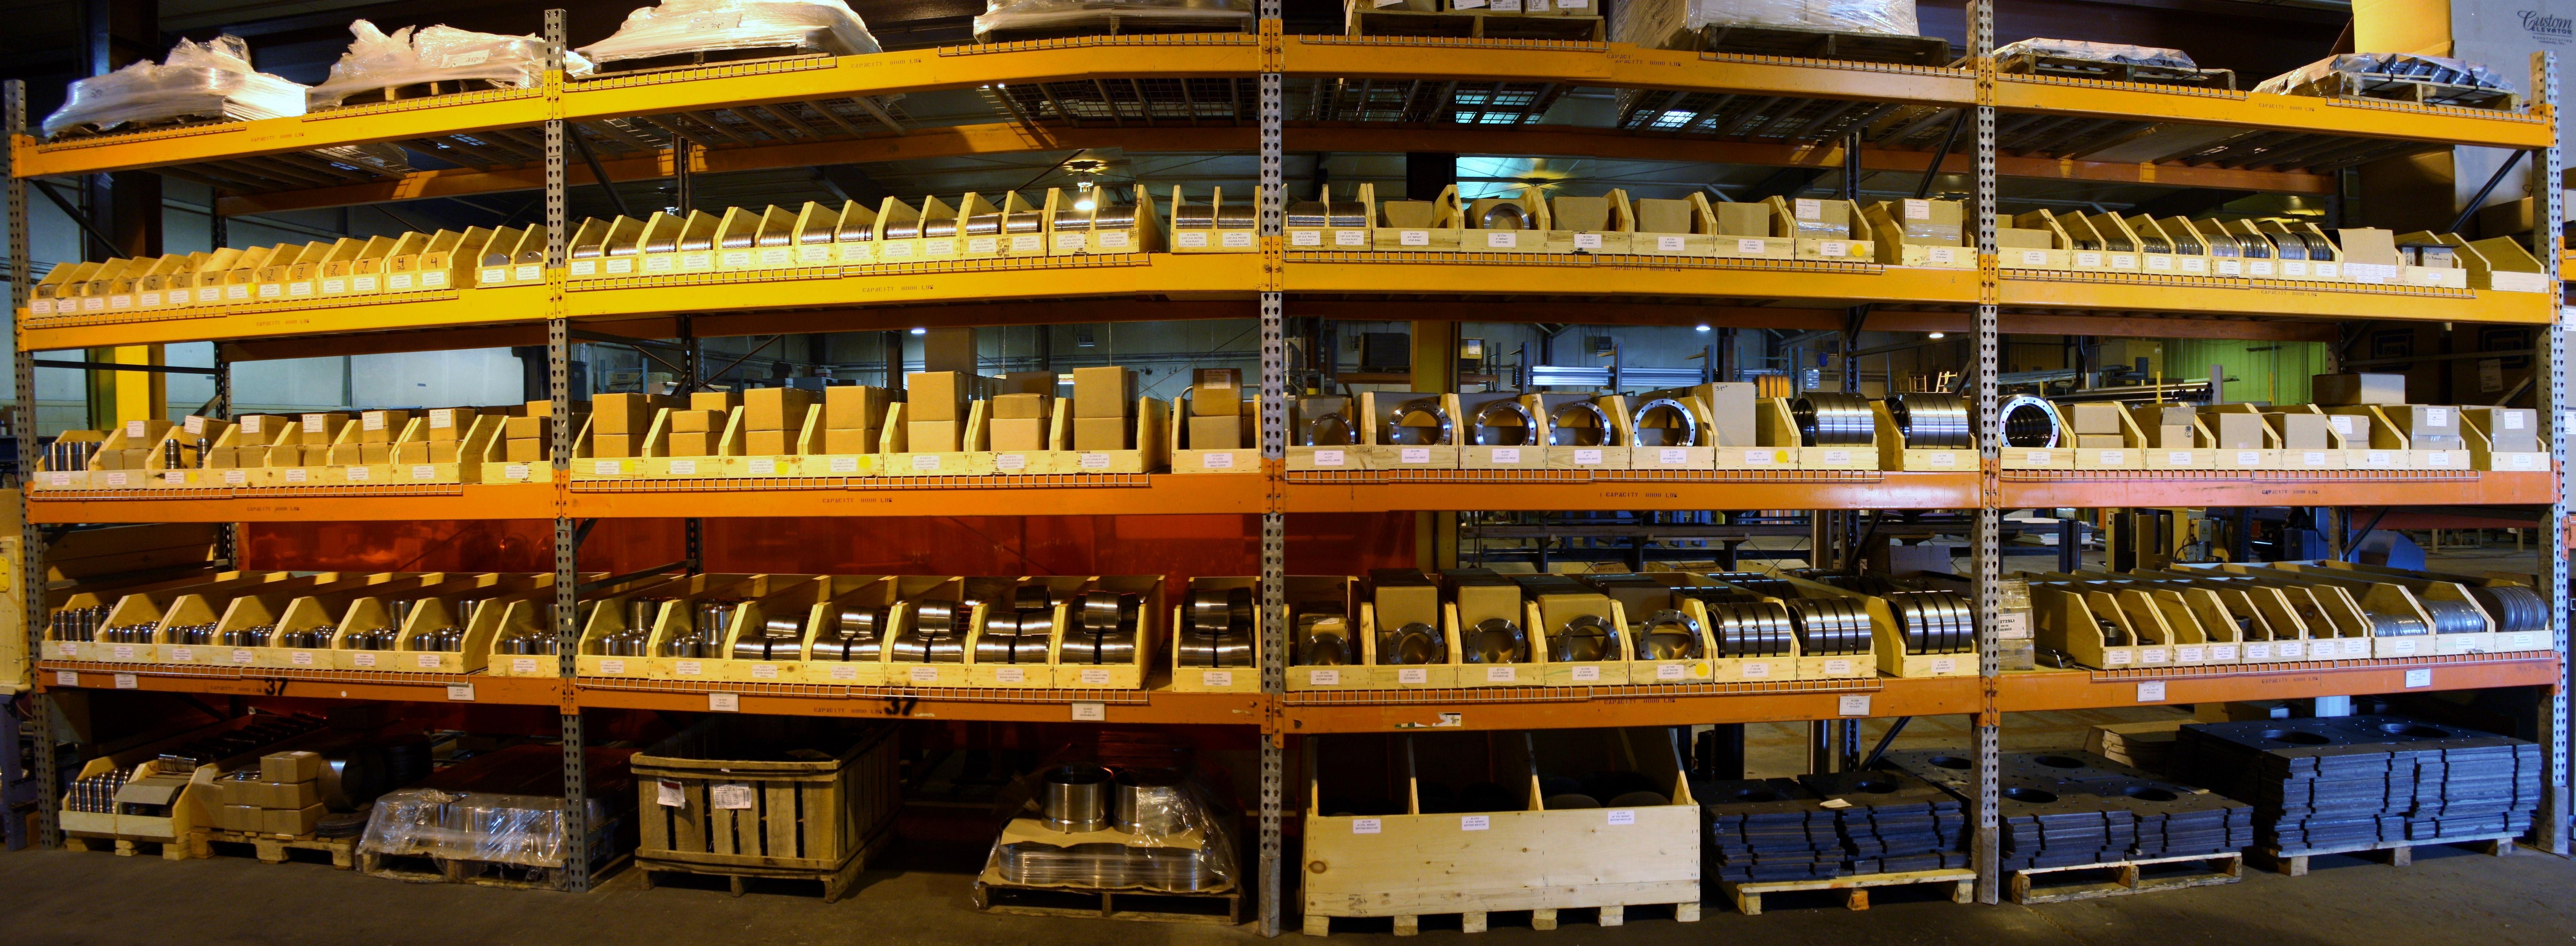 Inventory Racks